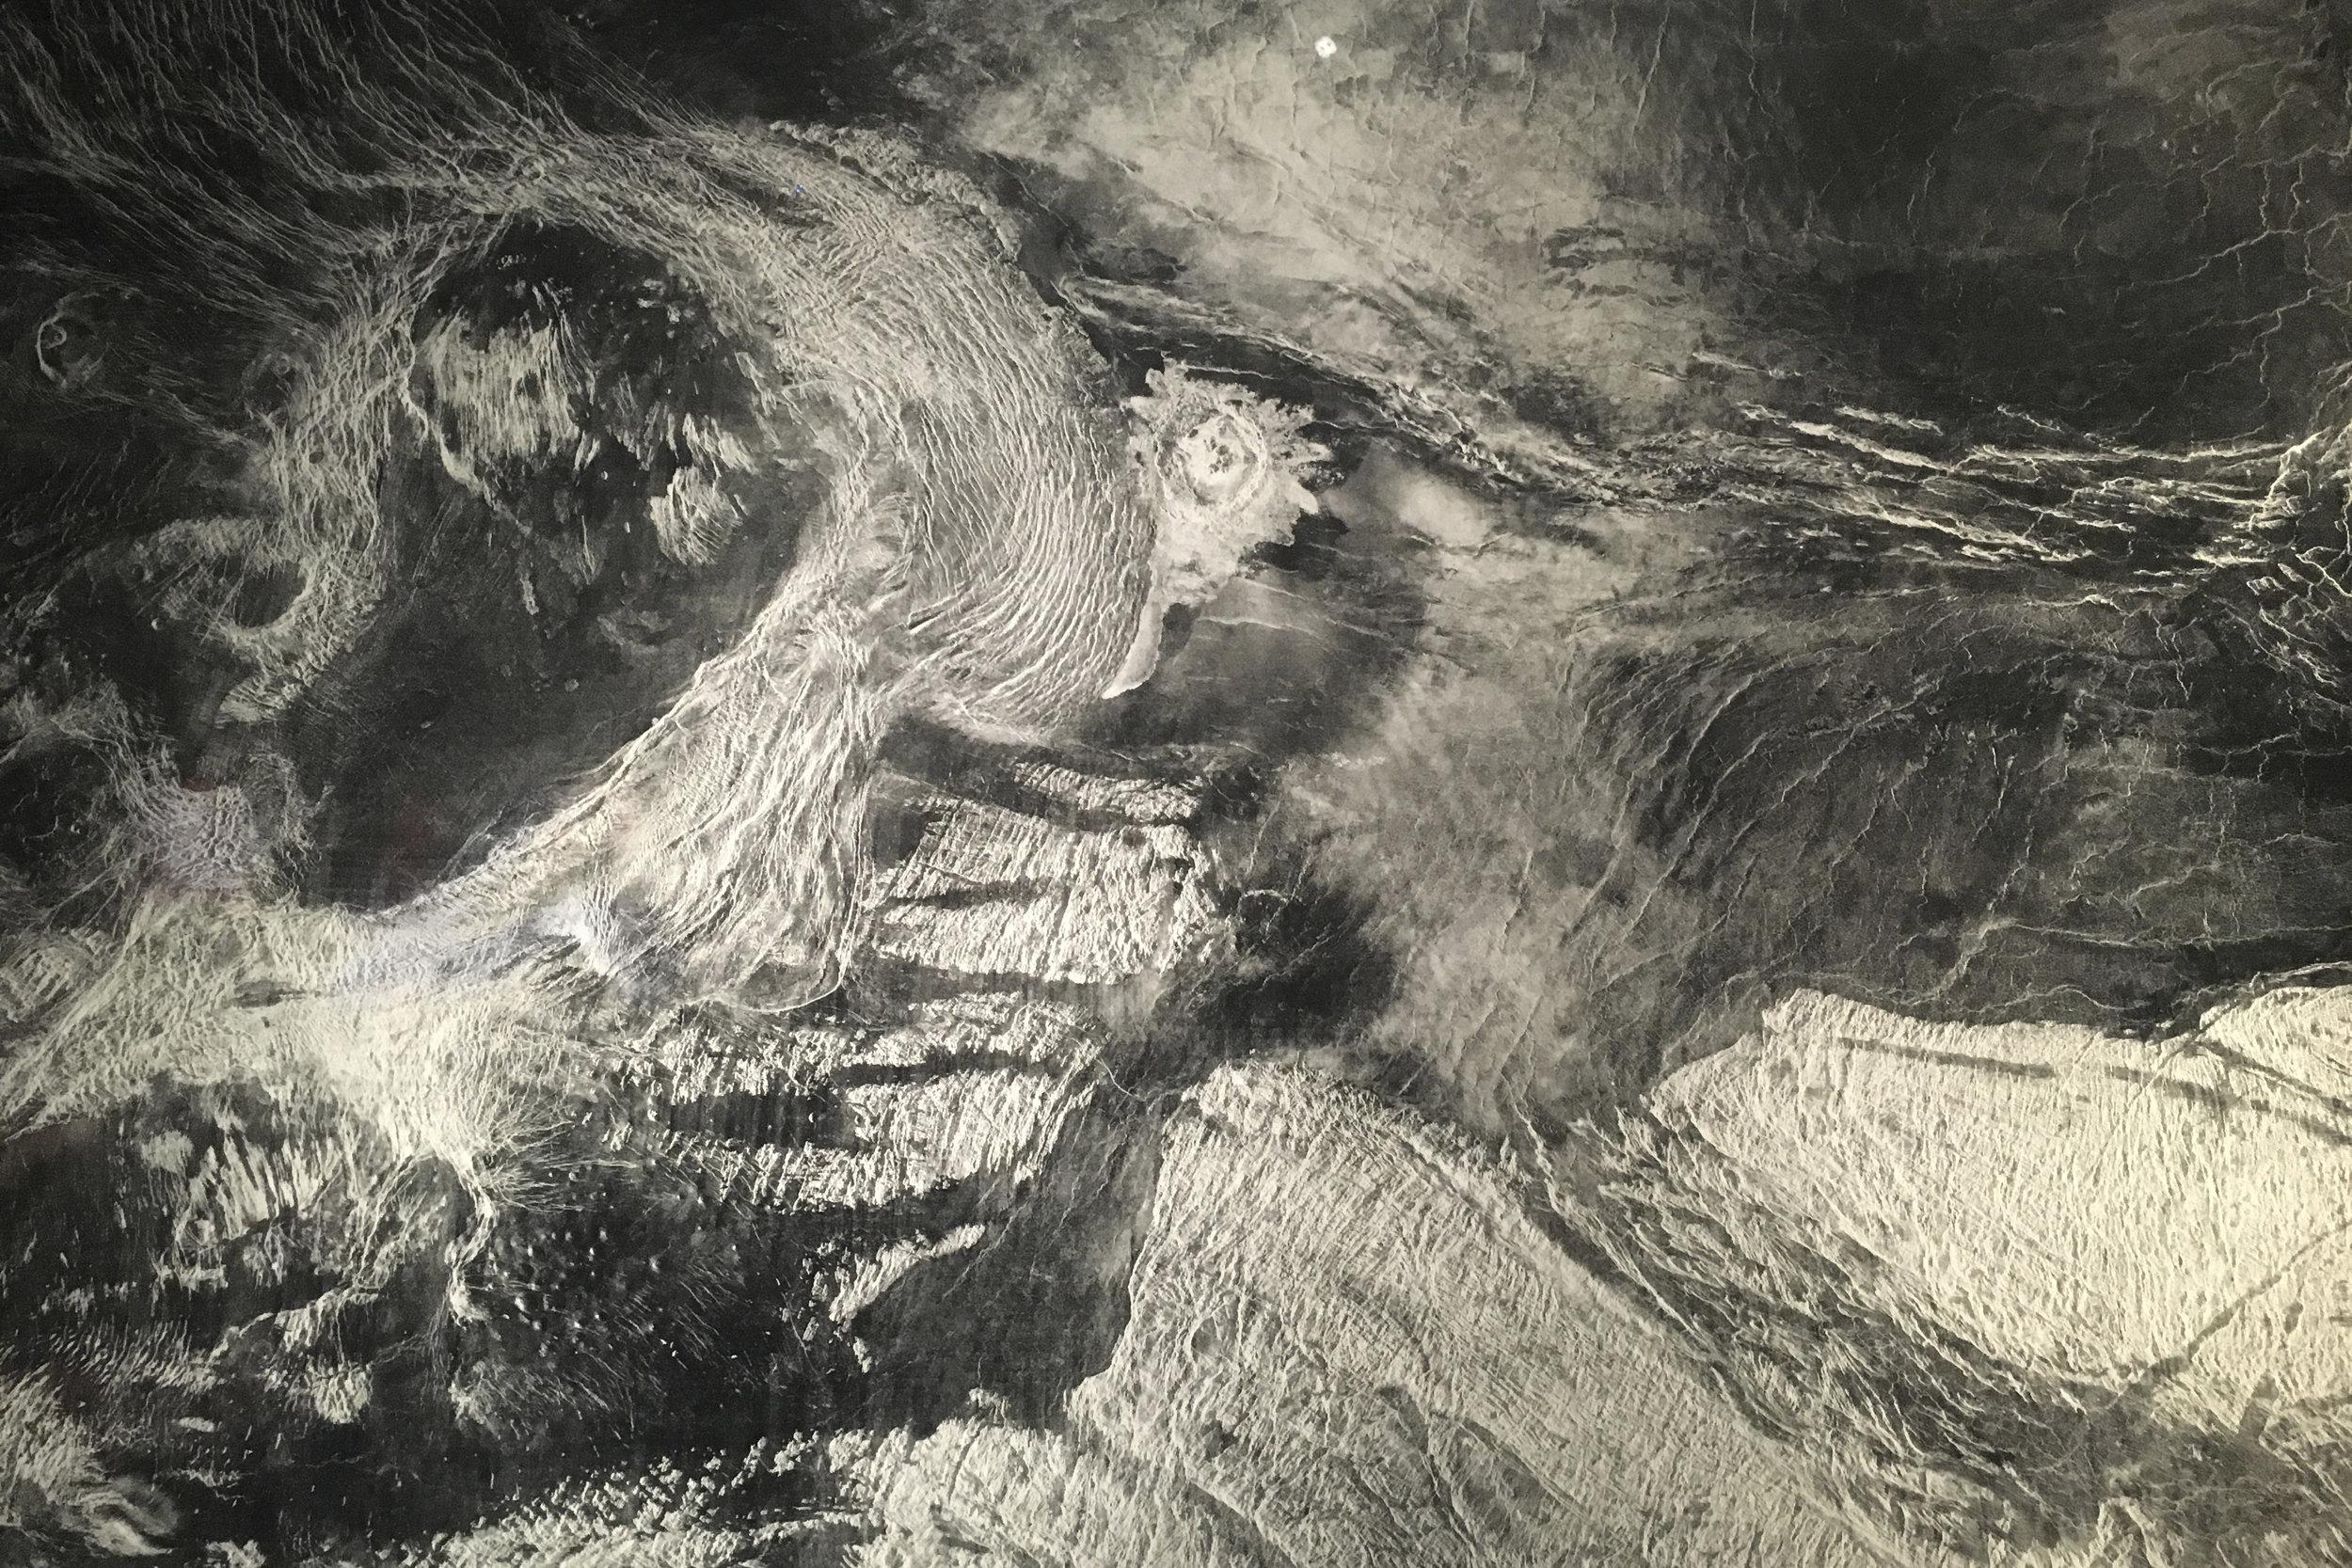 Michael Benson  Radar image, Magellan, Sept. 15, 1990 – Sept. 14, 1992 ( 2003). Photo: Stephen Bennett, taken at  Otherworlds  Exhibition, Natural History Museum, 2016. Artist's original works available here:http://michael-benson.net/author/michael/